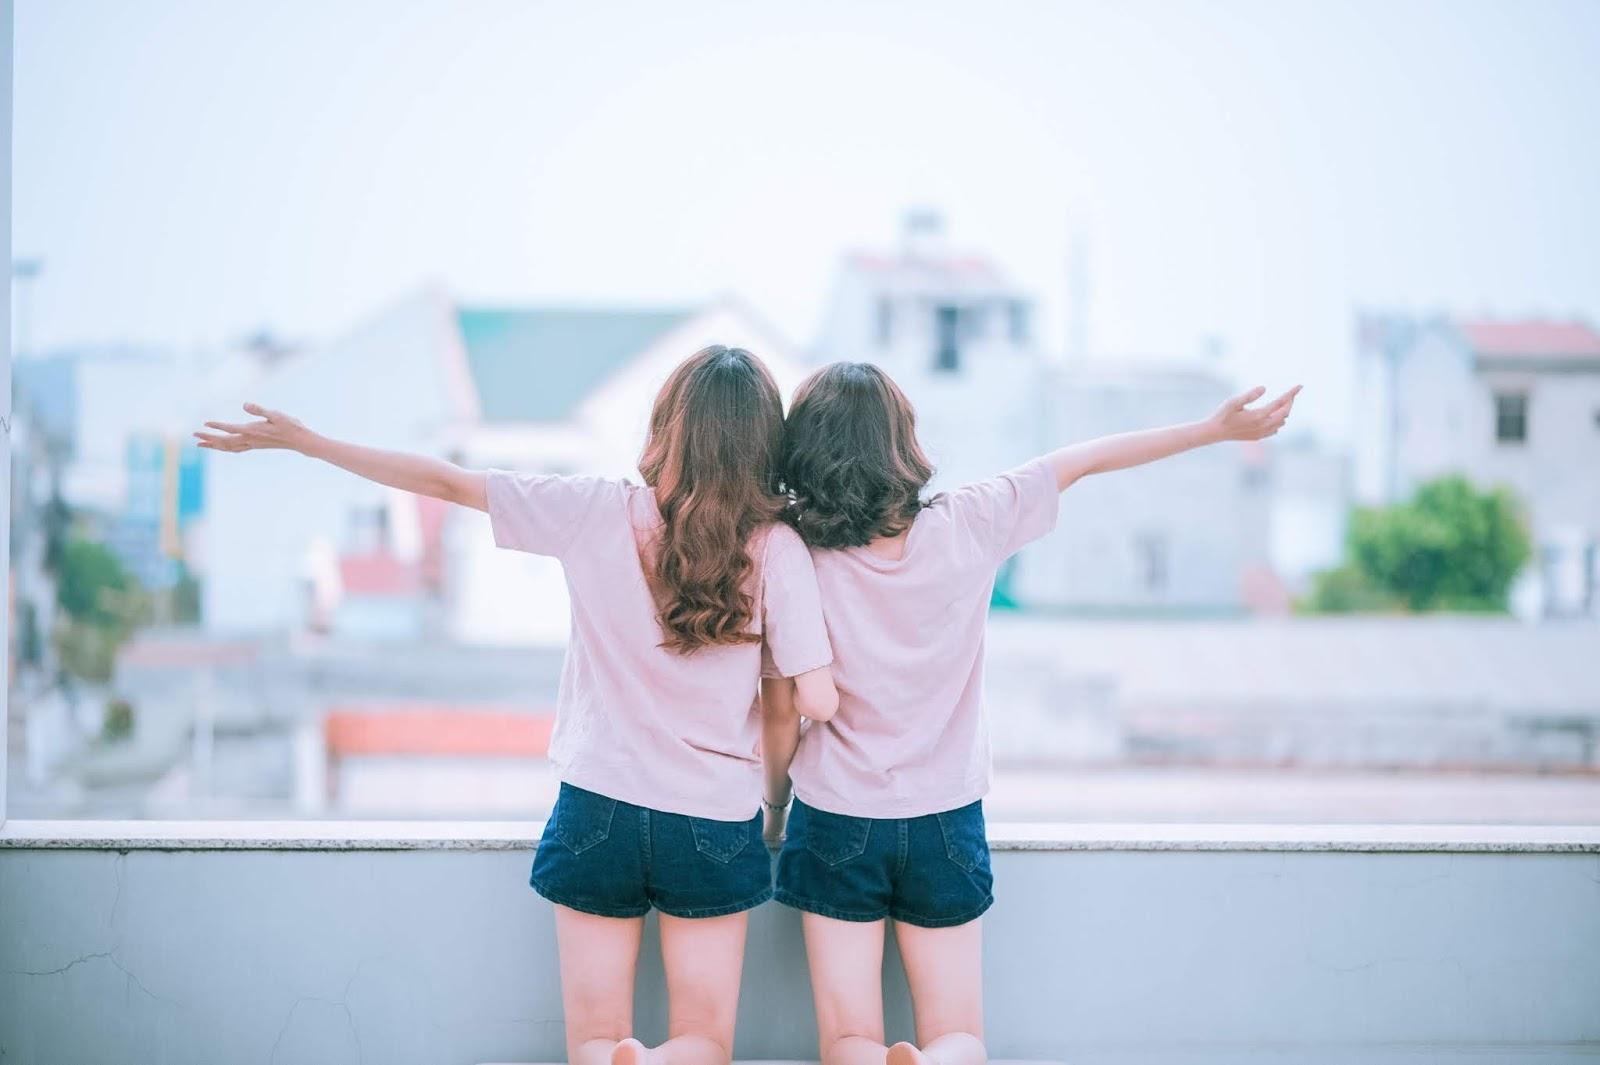 Caption Tentang Persahabatan Paling Baru dan Unik